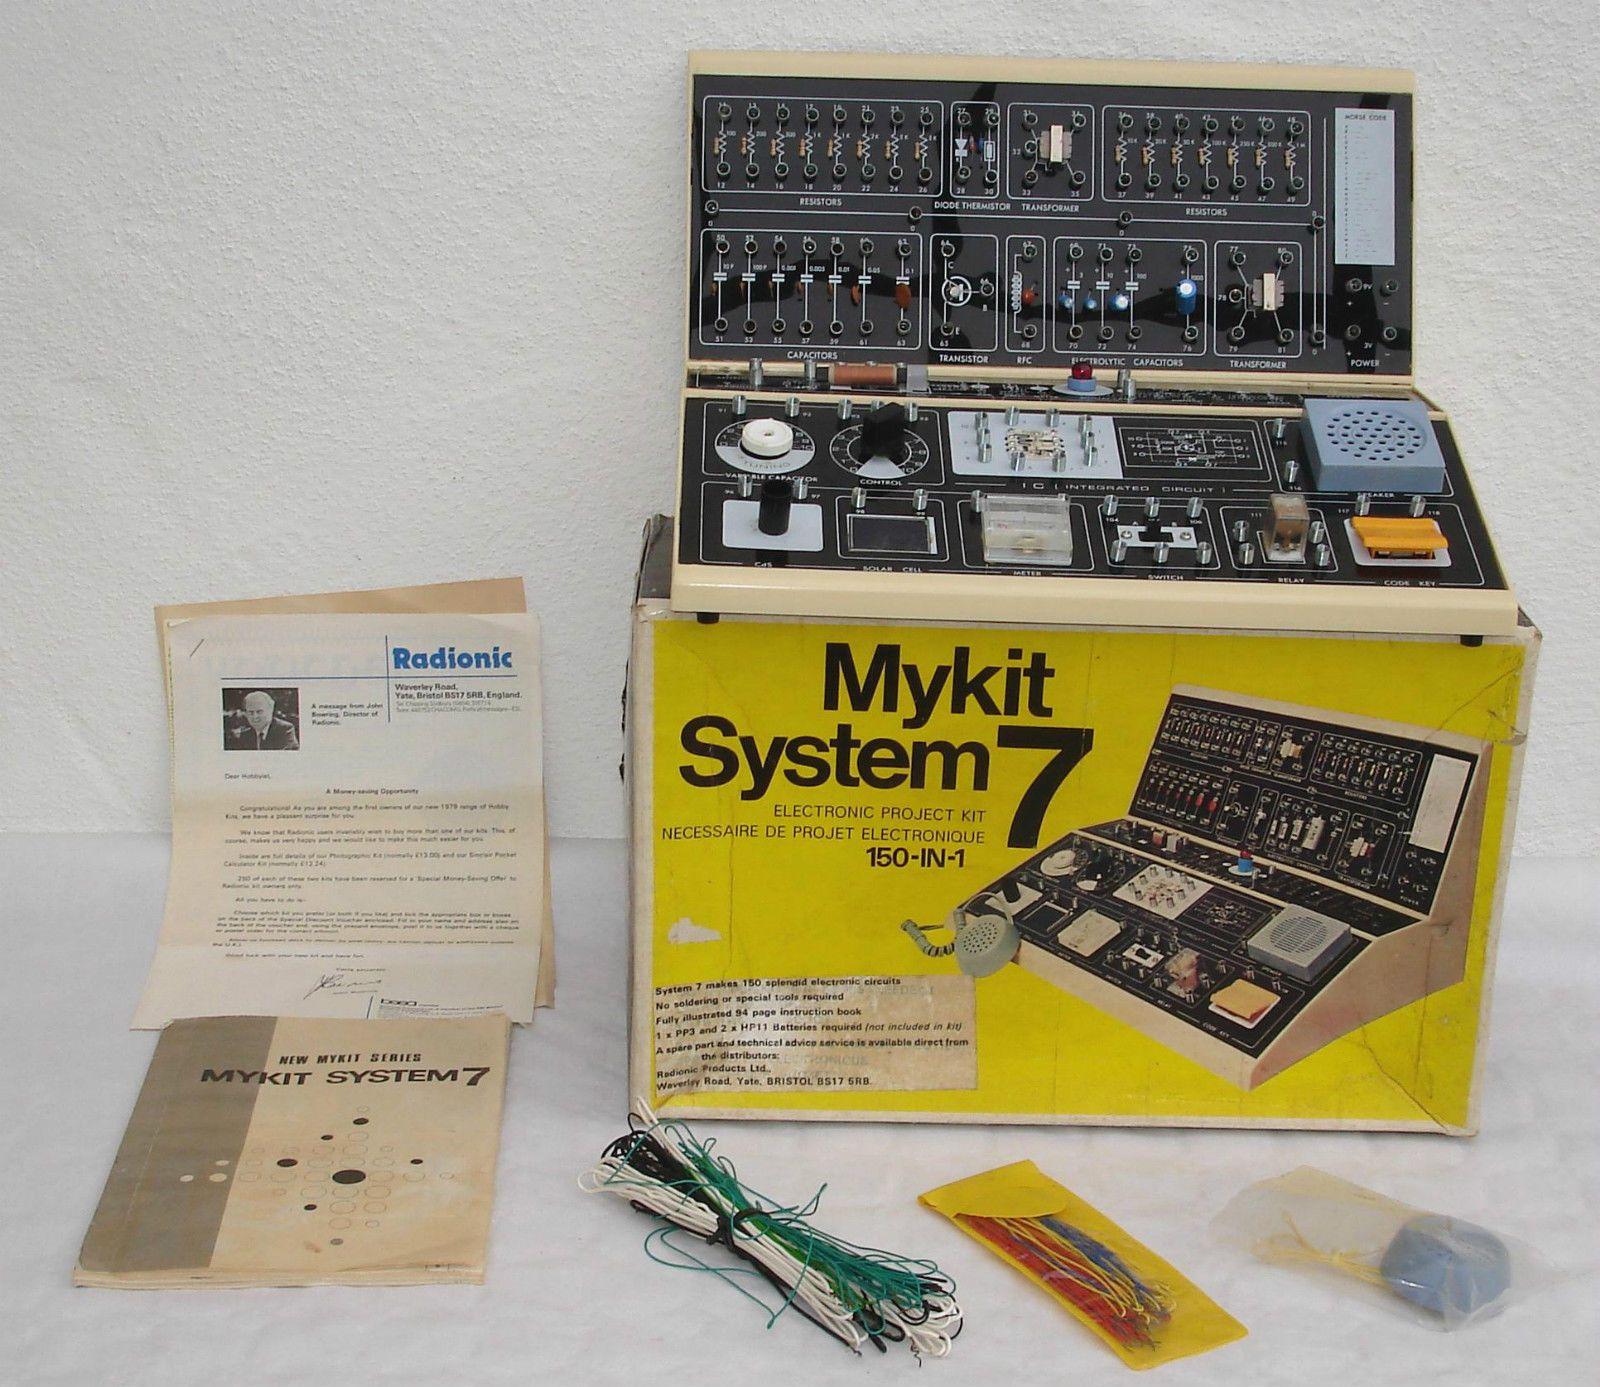 Mykit System 7 Elektronik Experimentierkasten von 1979 | eBay